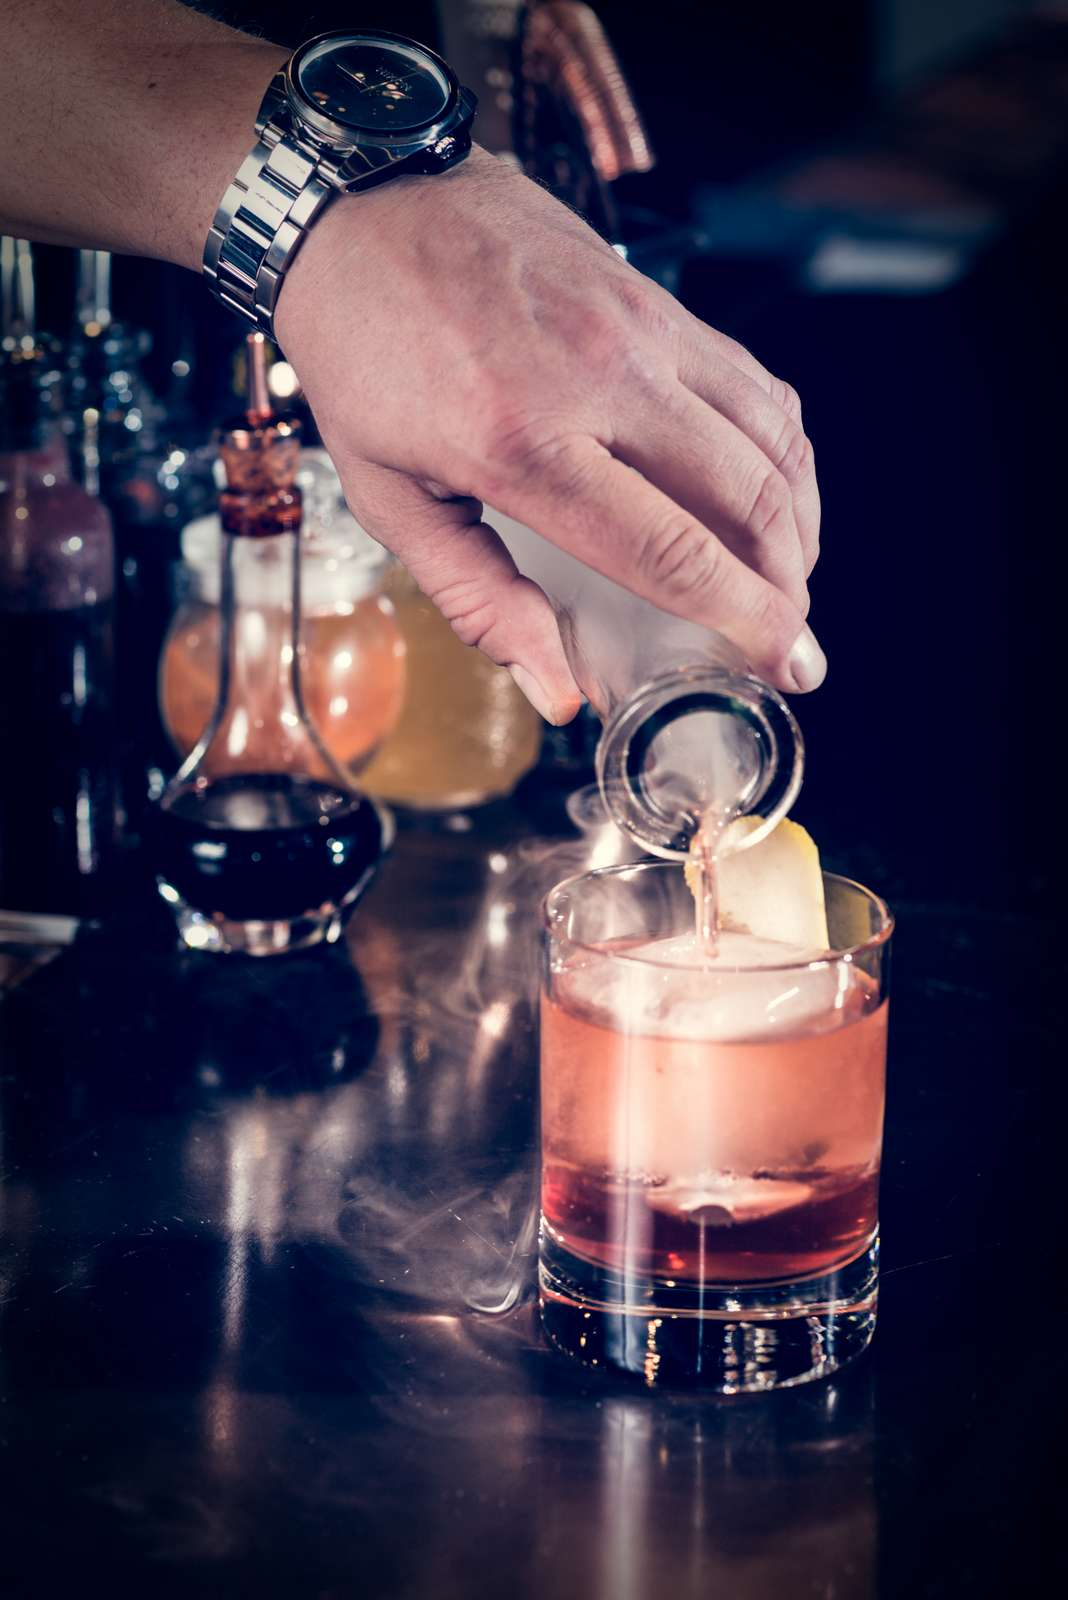 2015-09-27_Principle_Cocktails_Alternate_005.jpg